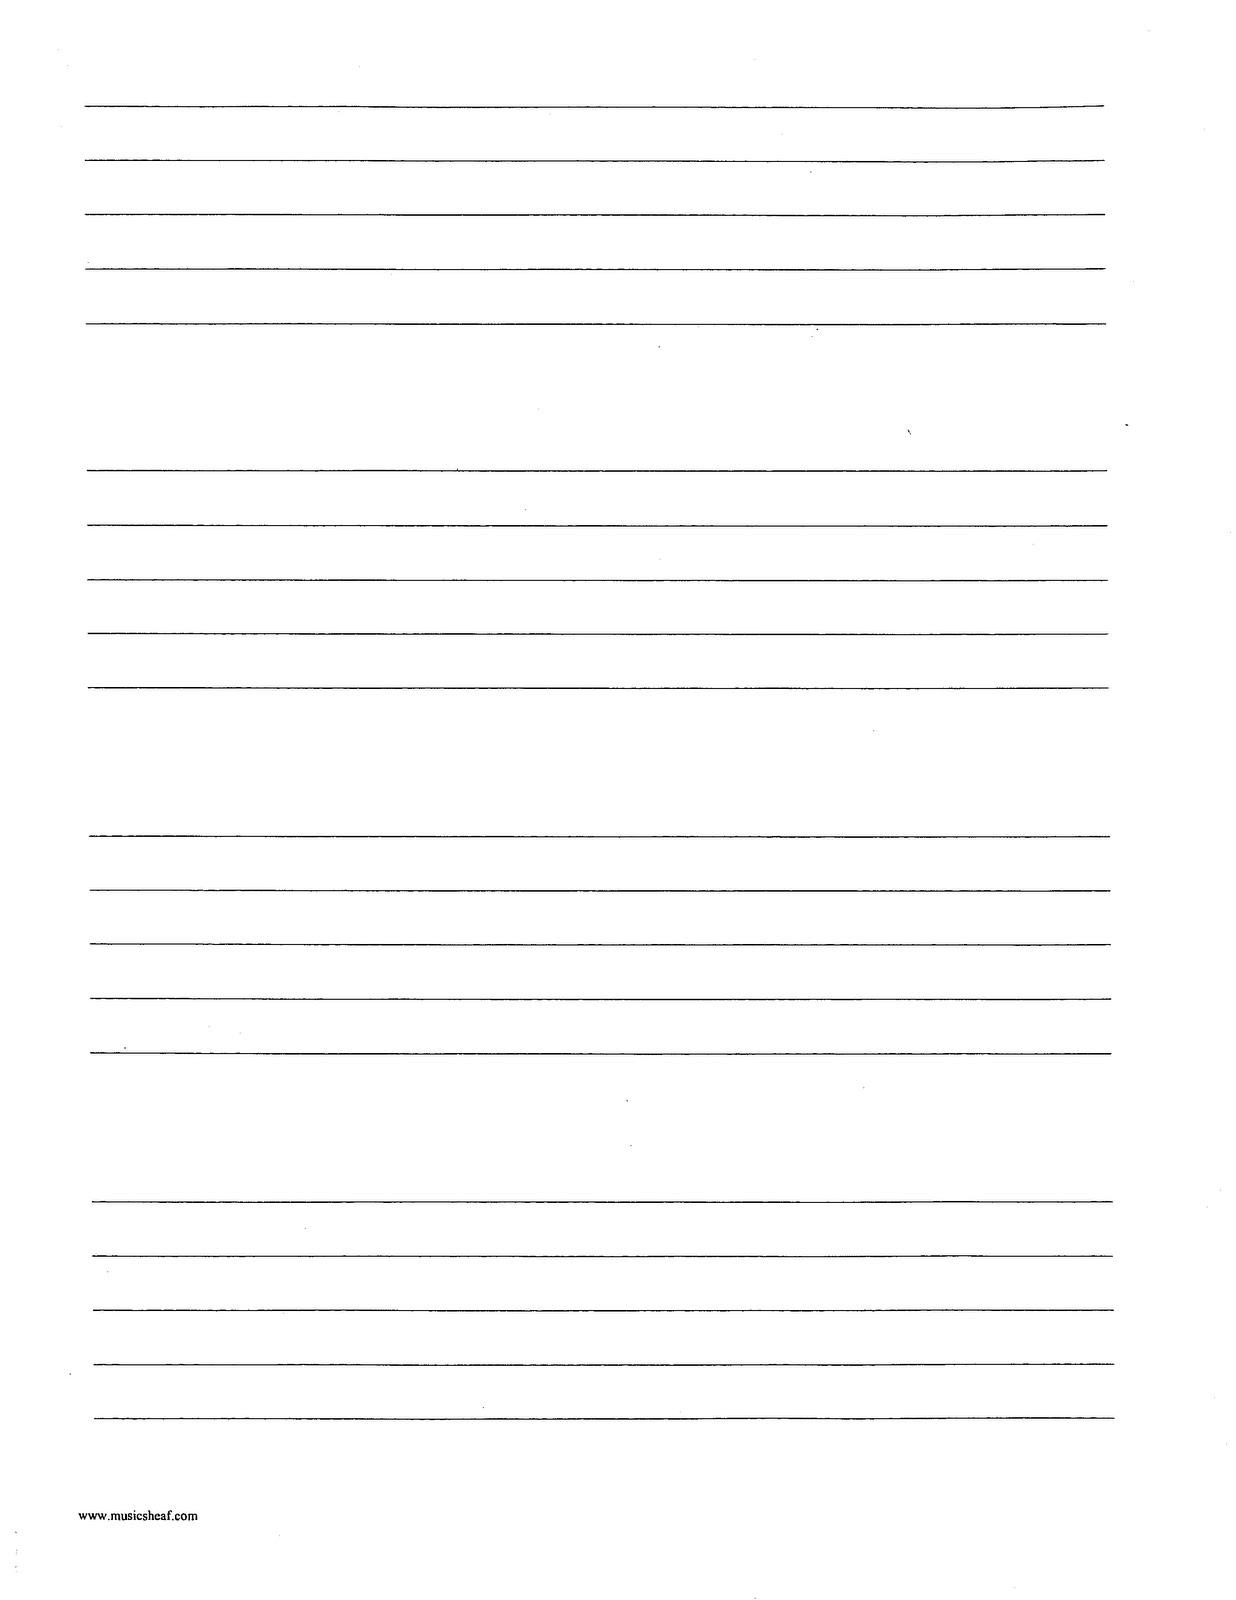 staf paper